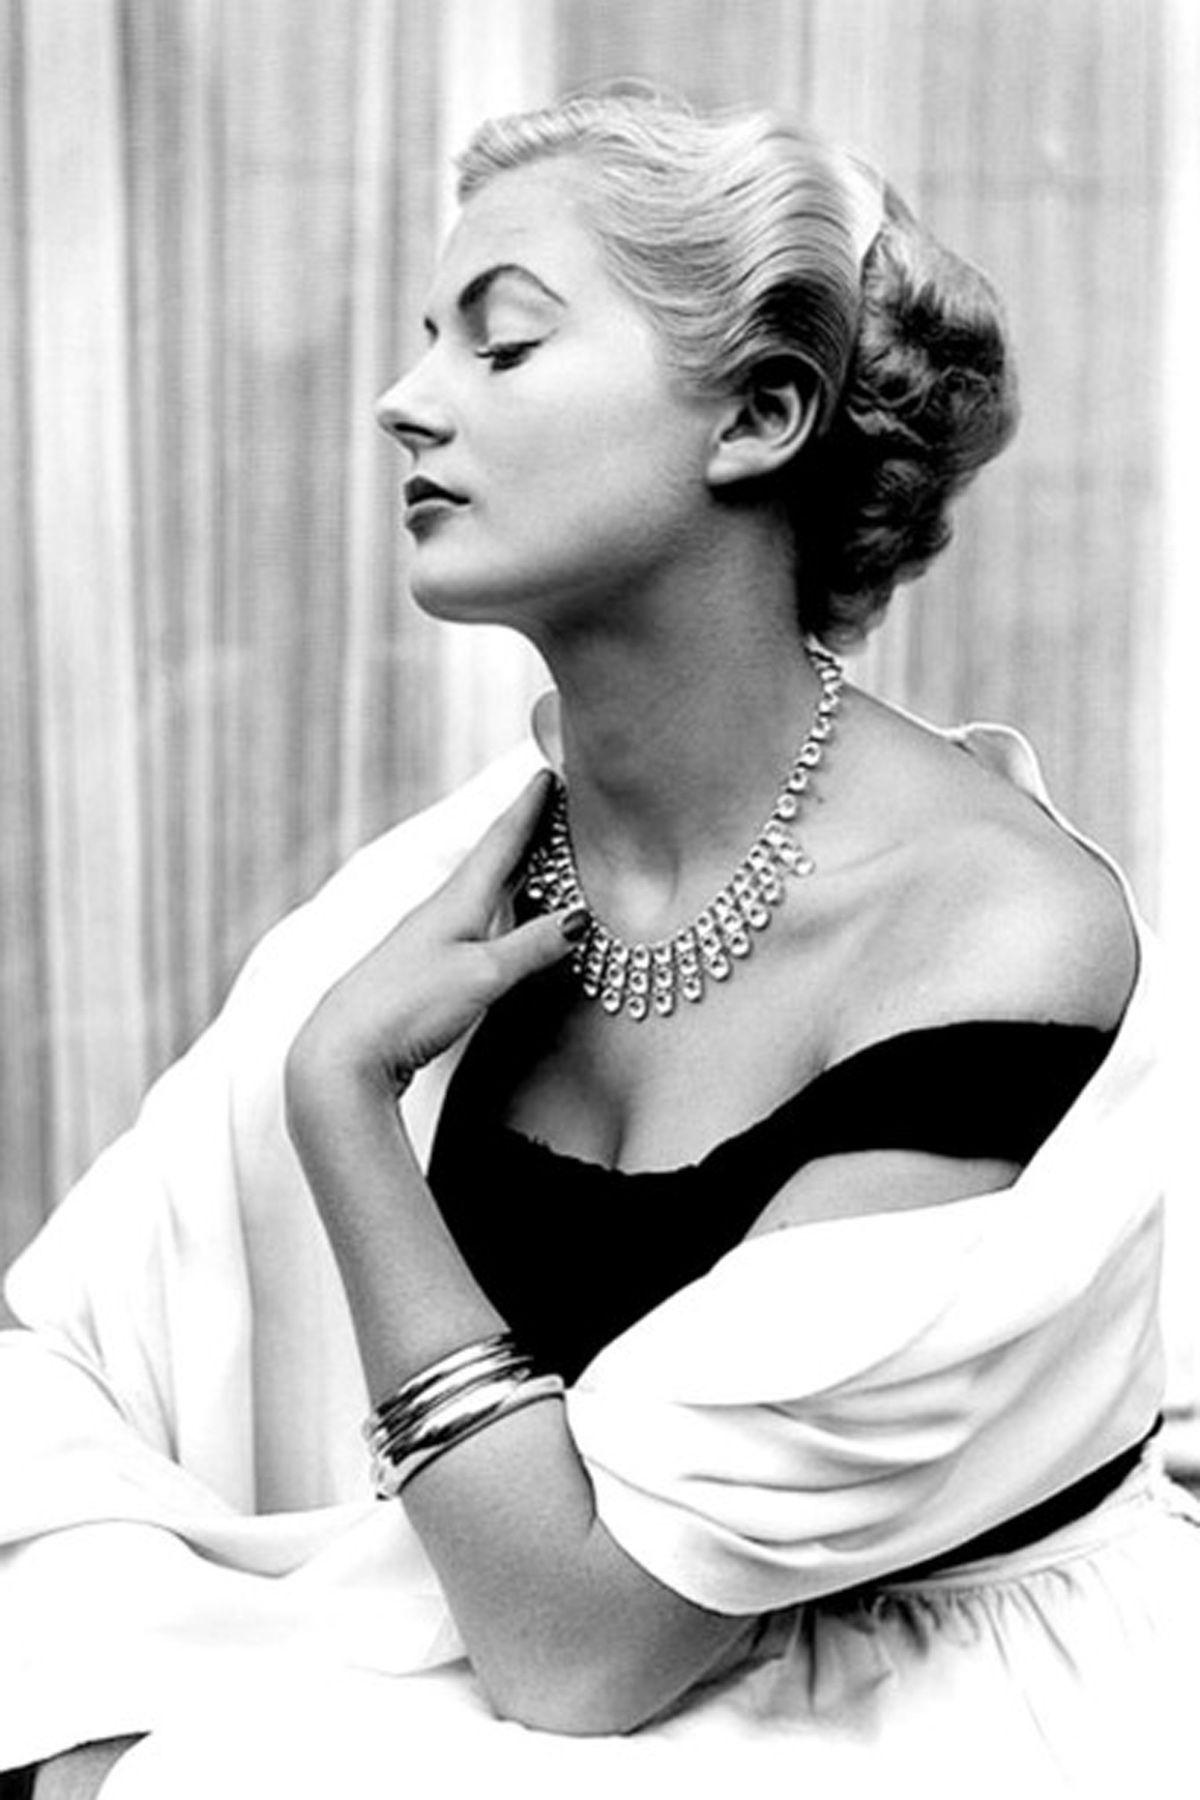 50s vogue waves and curls. | Vintage Bridal Hair | Pinterest | 1950s ...